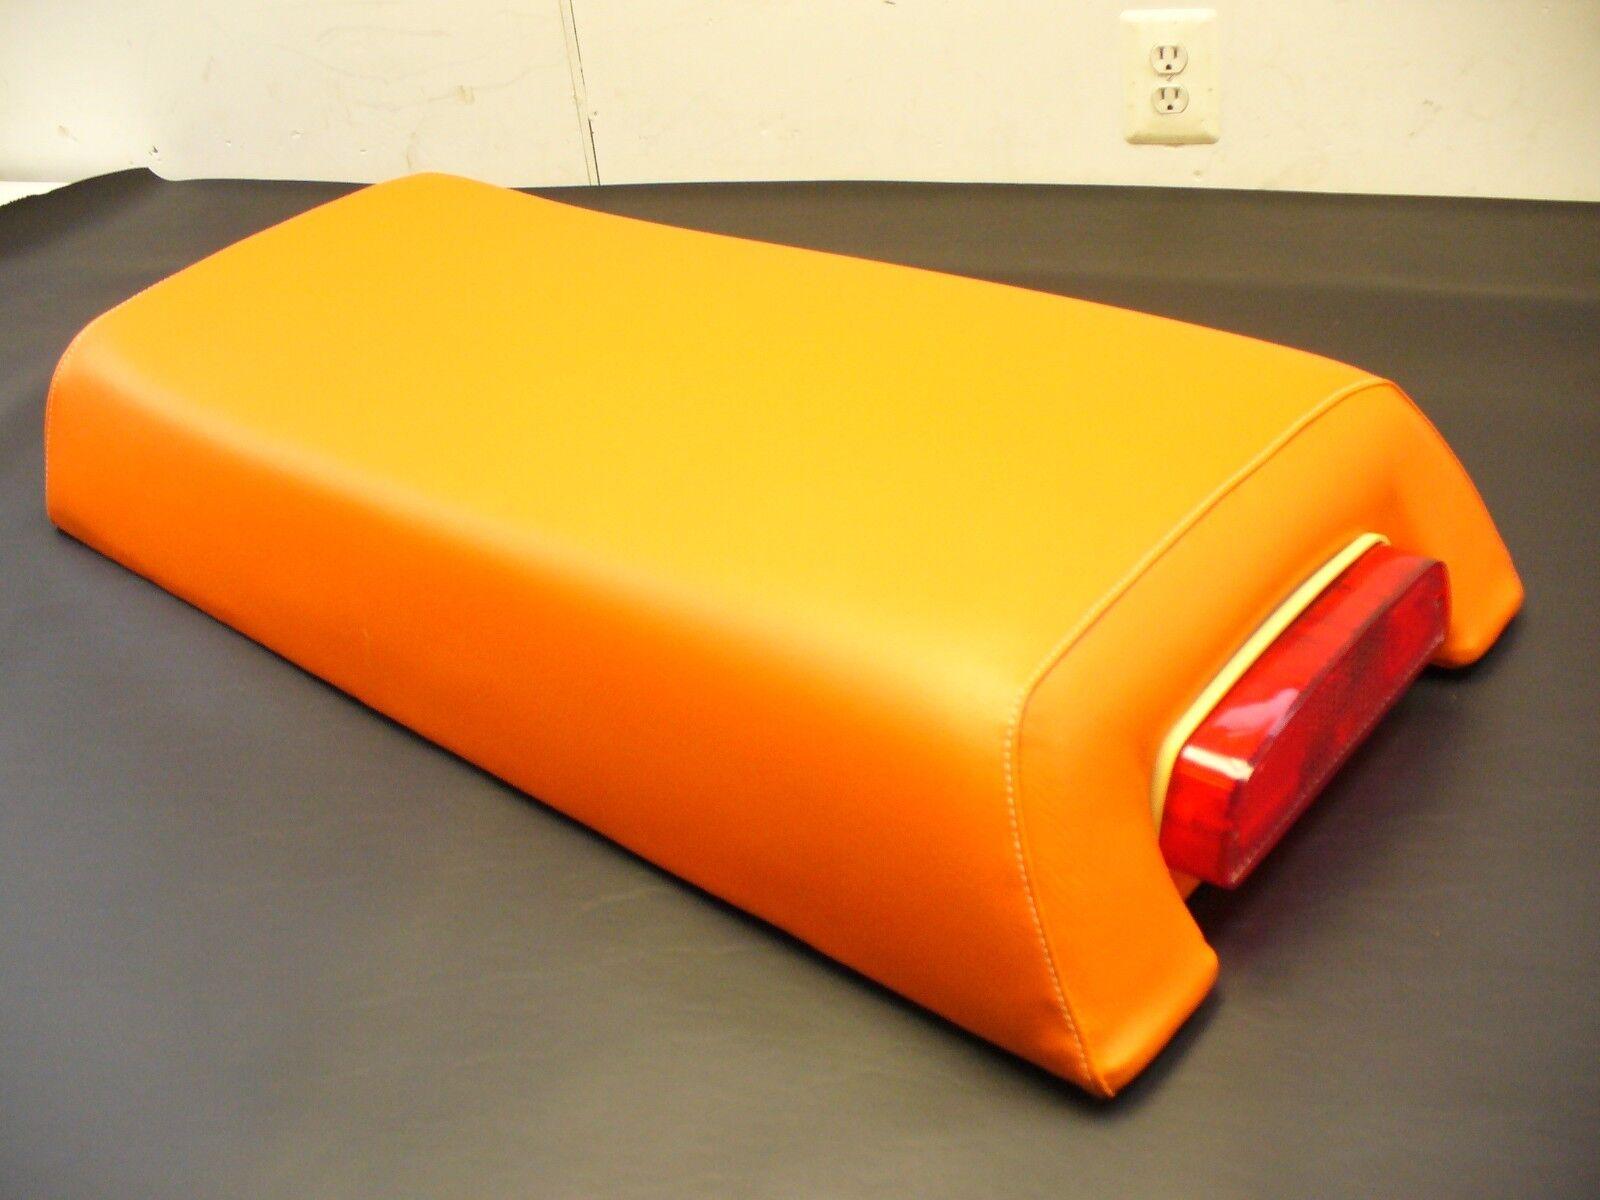 75 MOTOSKI SONIC TS Orange SNOWMOBILE SEAT COVER NEW